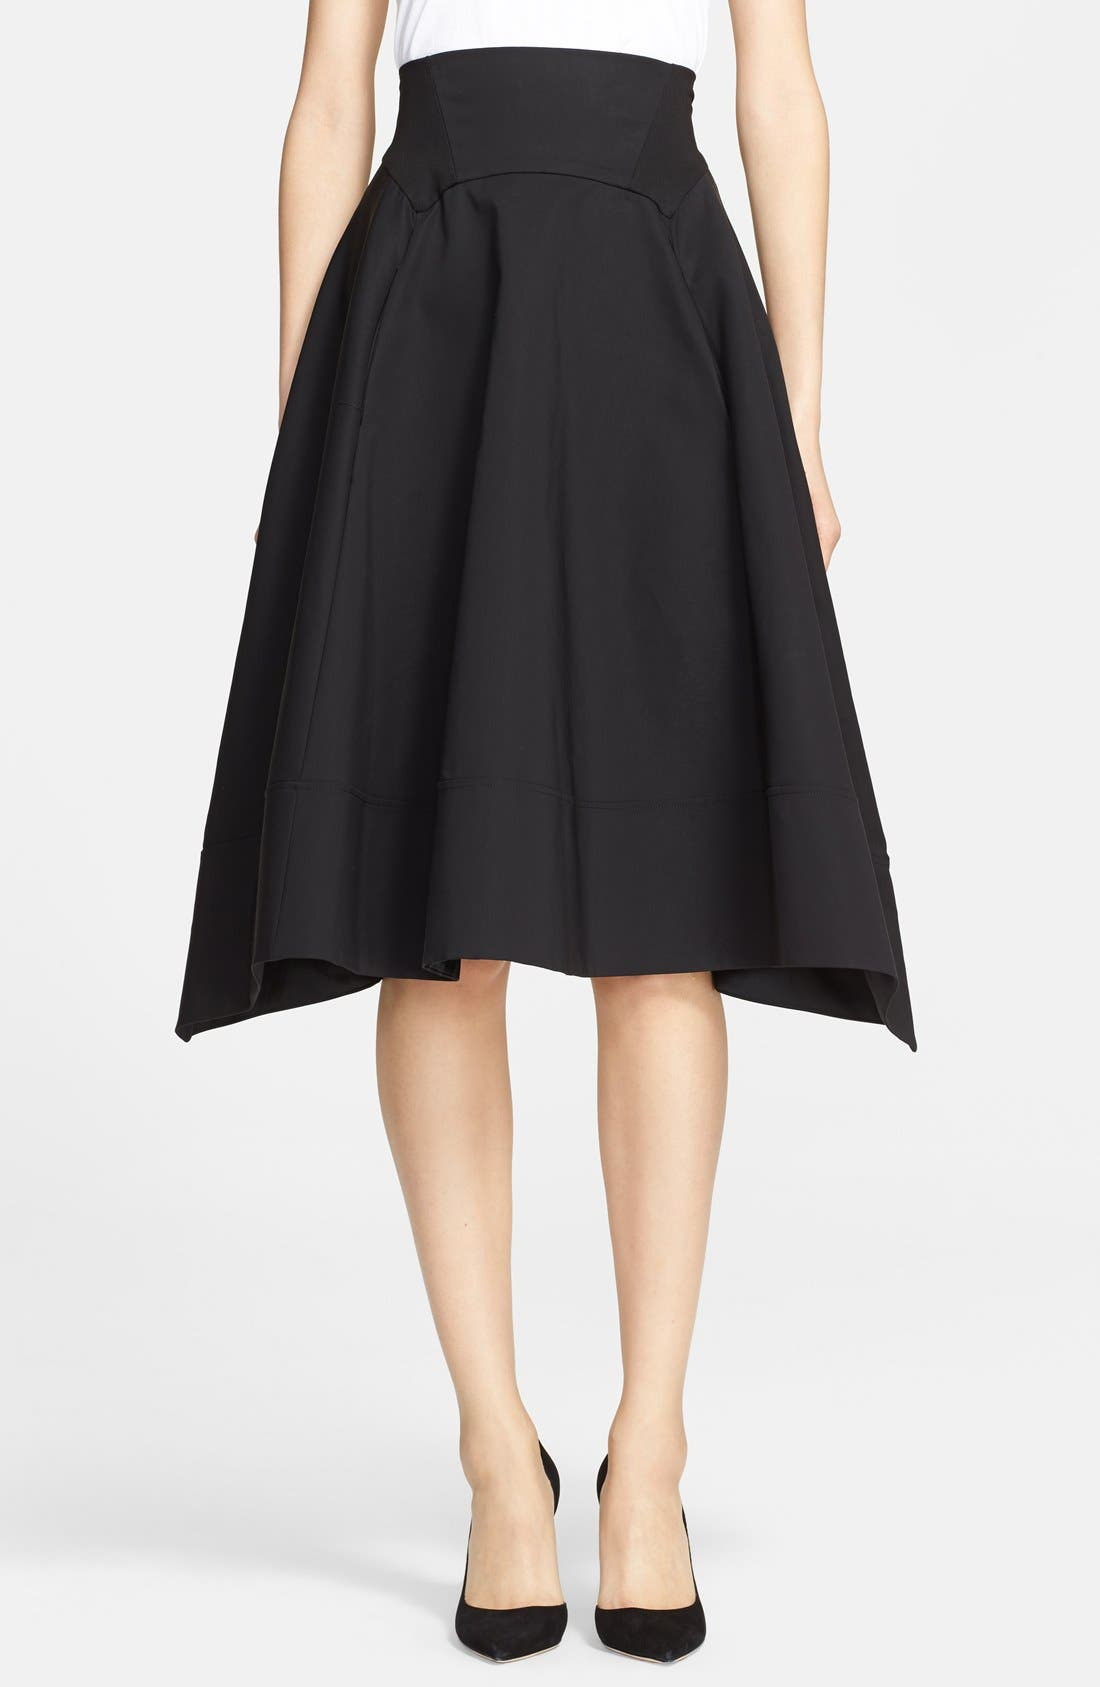 Donna Karan Collection Cotton Taffeta Skirt,                             Main thumbnail 1, color,                             001